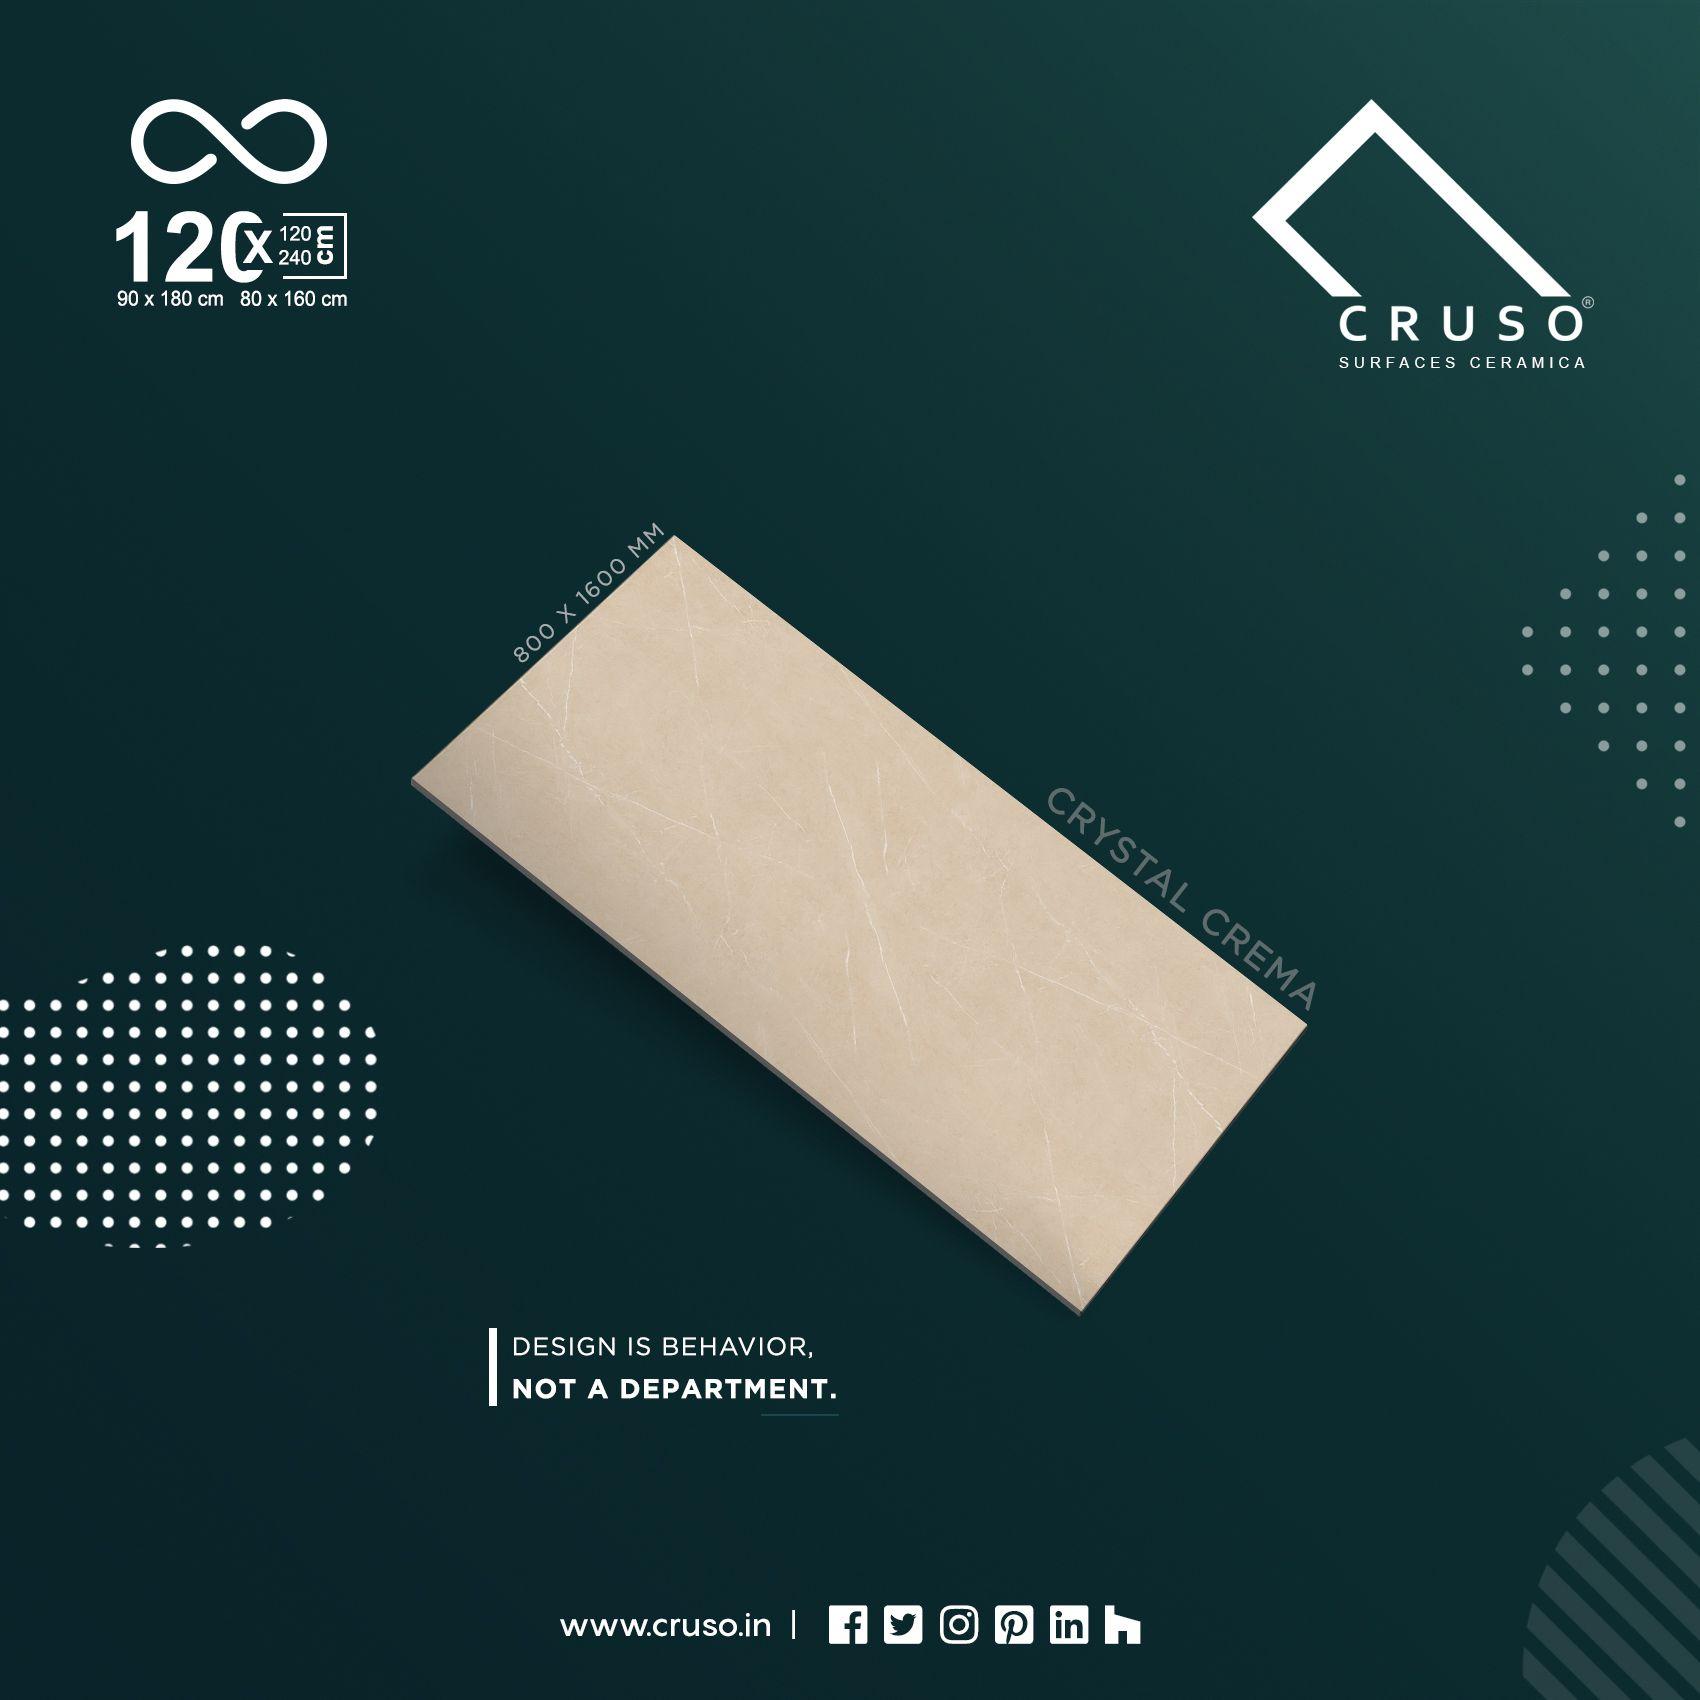 Design Is Behavior Not A Department Cruso Morderndesign Architech Bigsizecruso Vitrified Tile Ceramic In 2020 Tile Manufacturers Vitrified Tiles Floor Slab